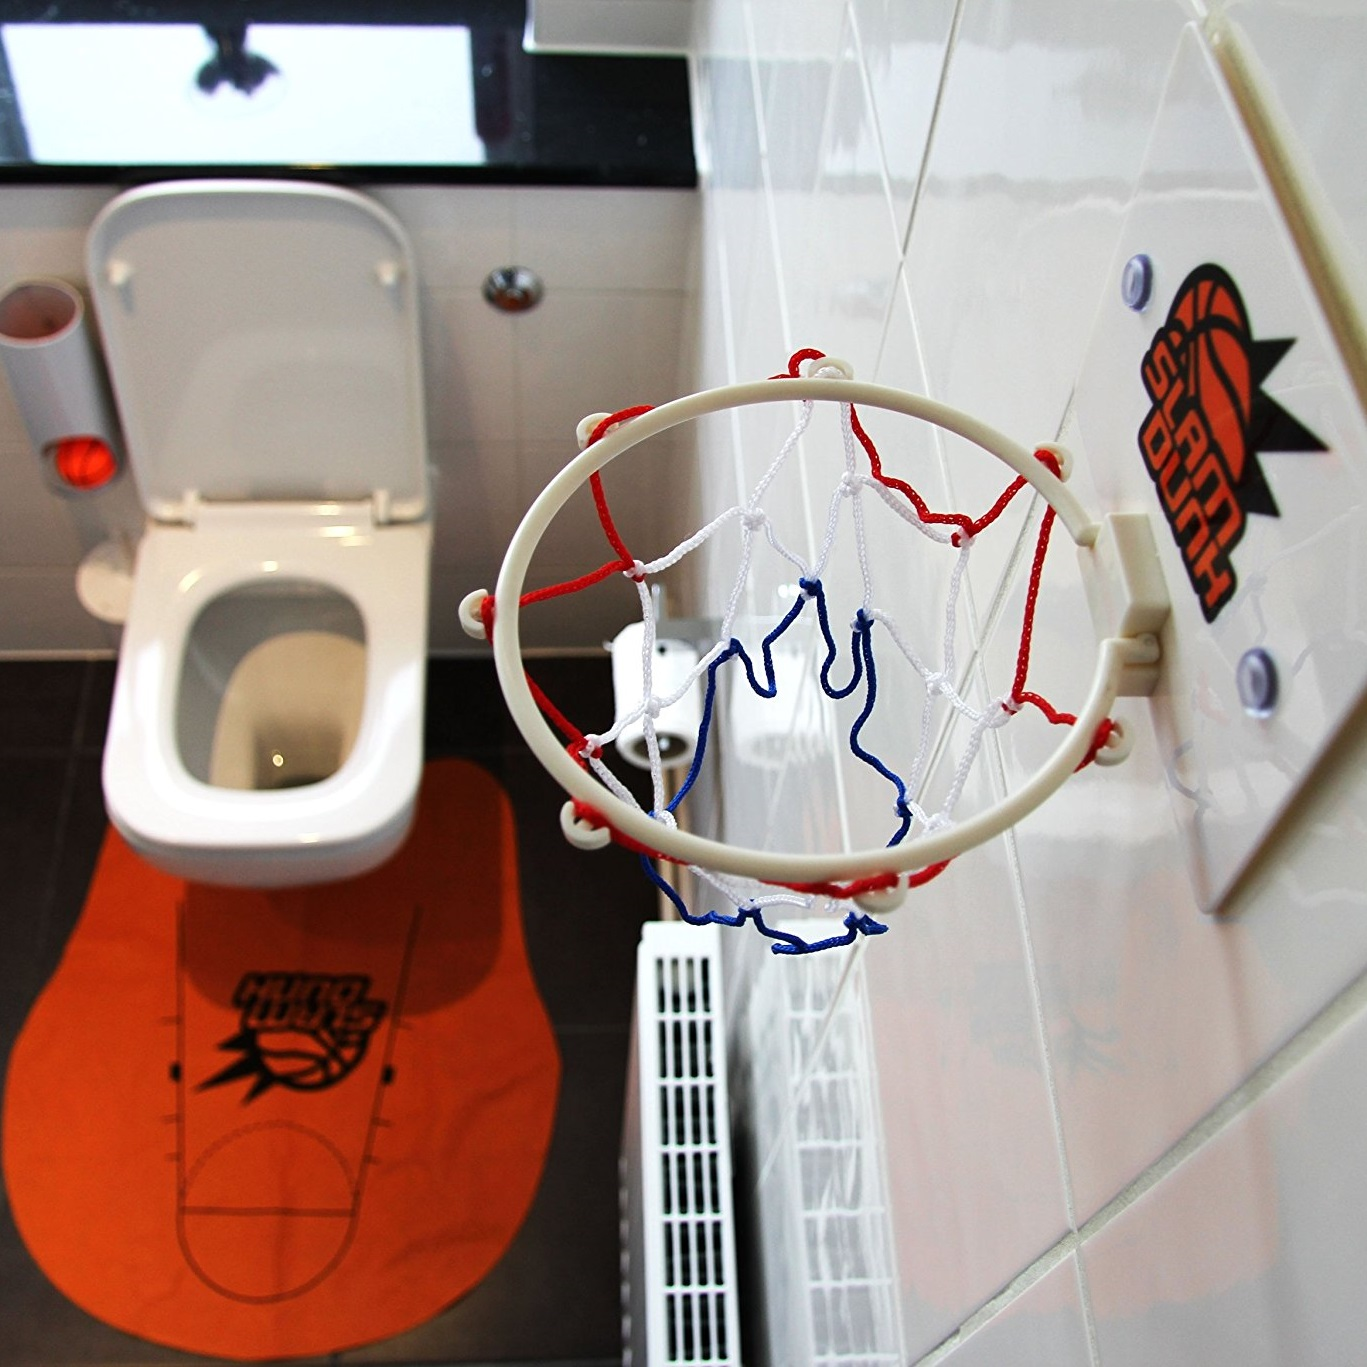 jeu-basket-toilettes-wc